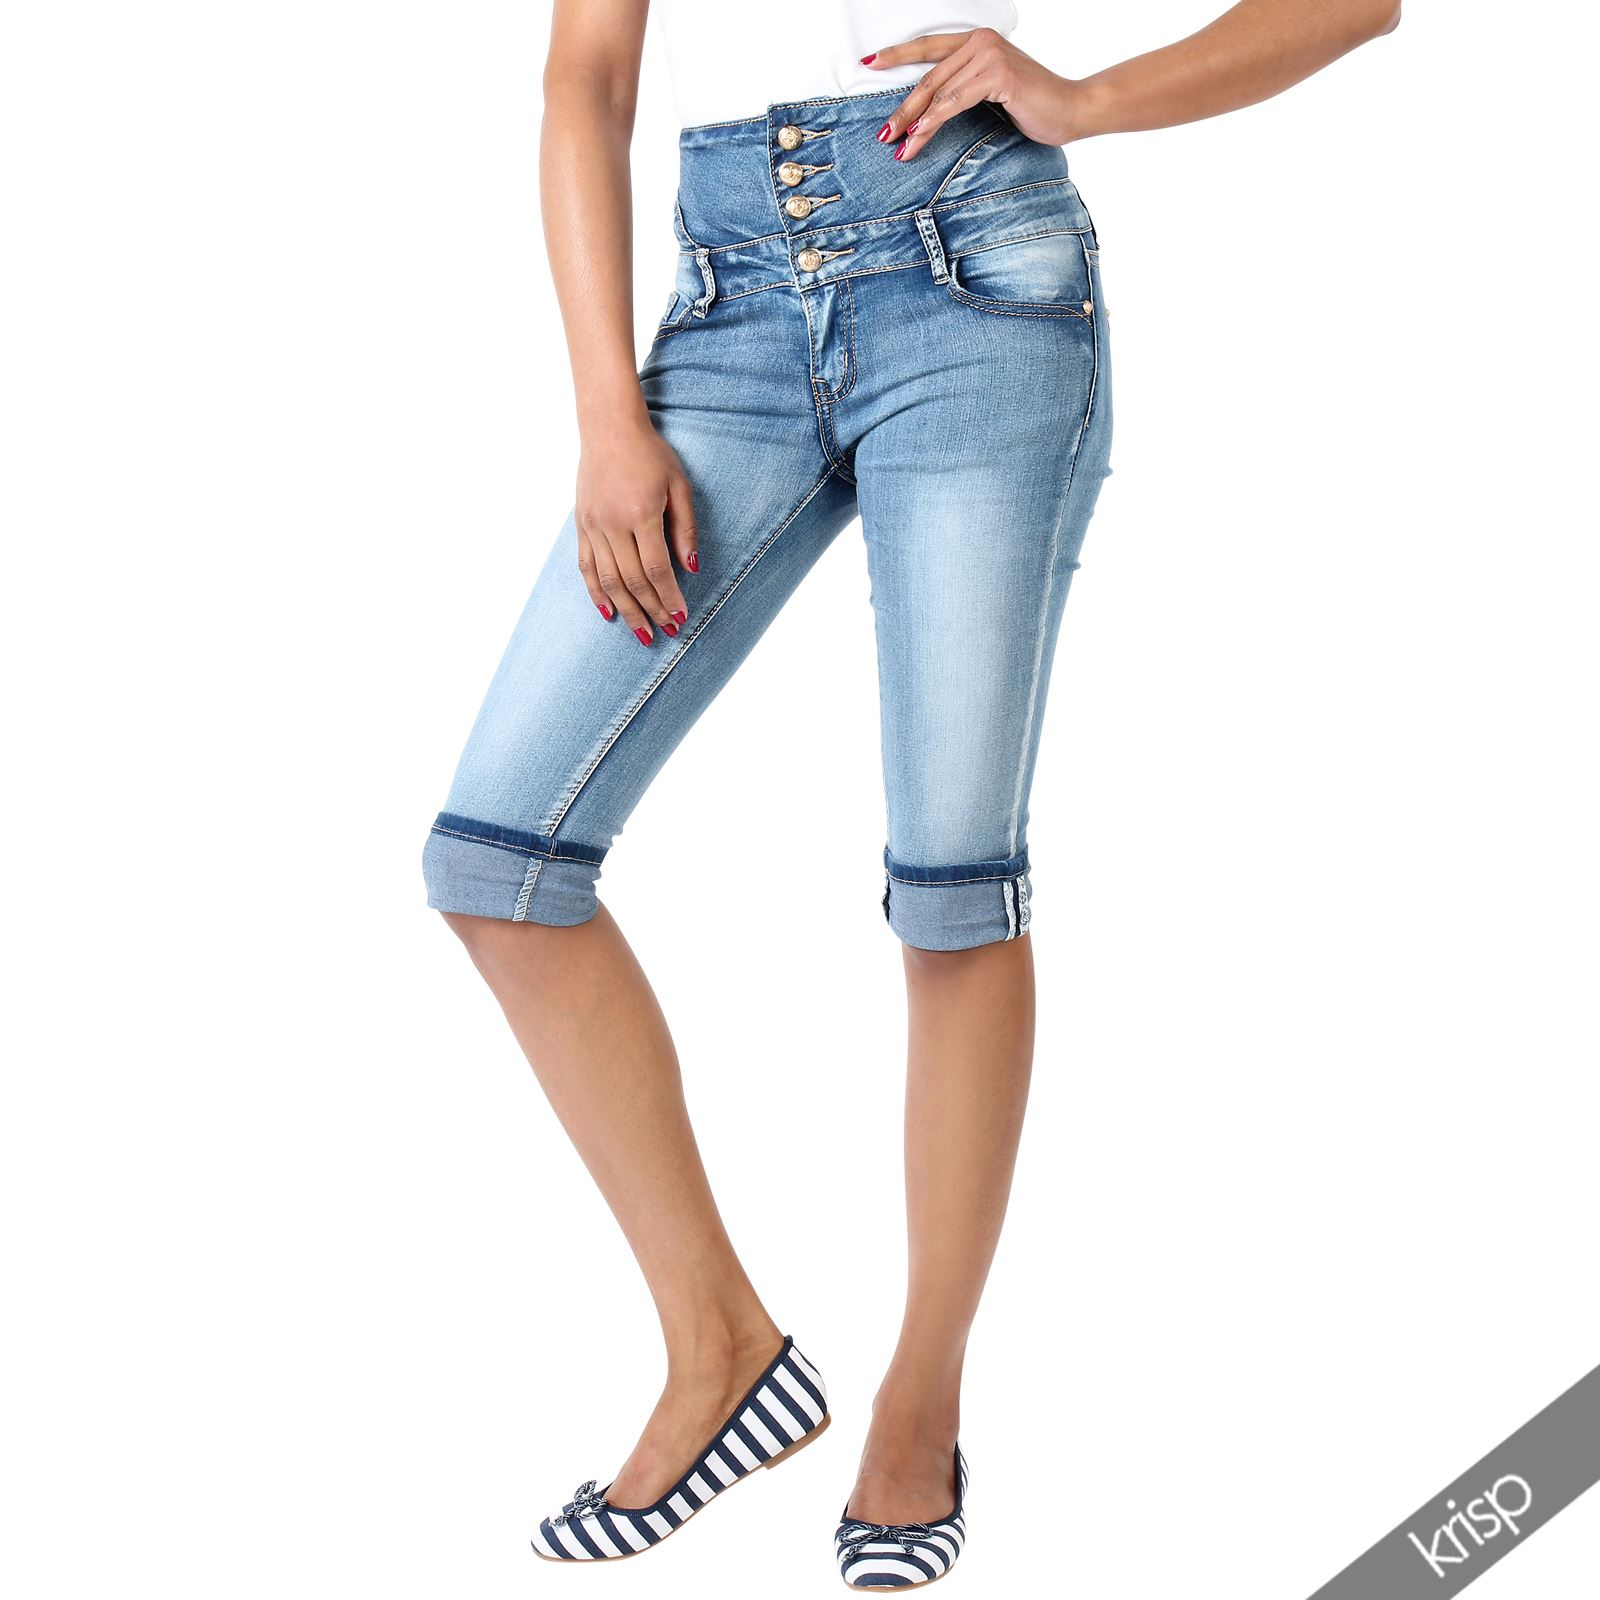 damen denim capri hose hoher bund kurze halblange stretch skinny jeans shorts ebay. Black Bedroom Furniture Sets. Home Design Ideas